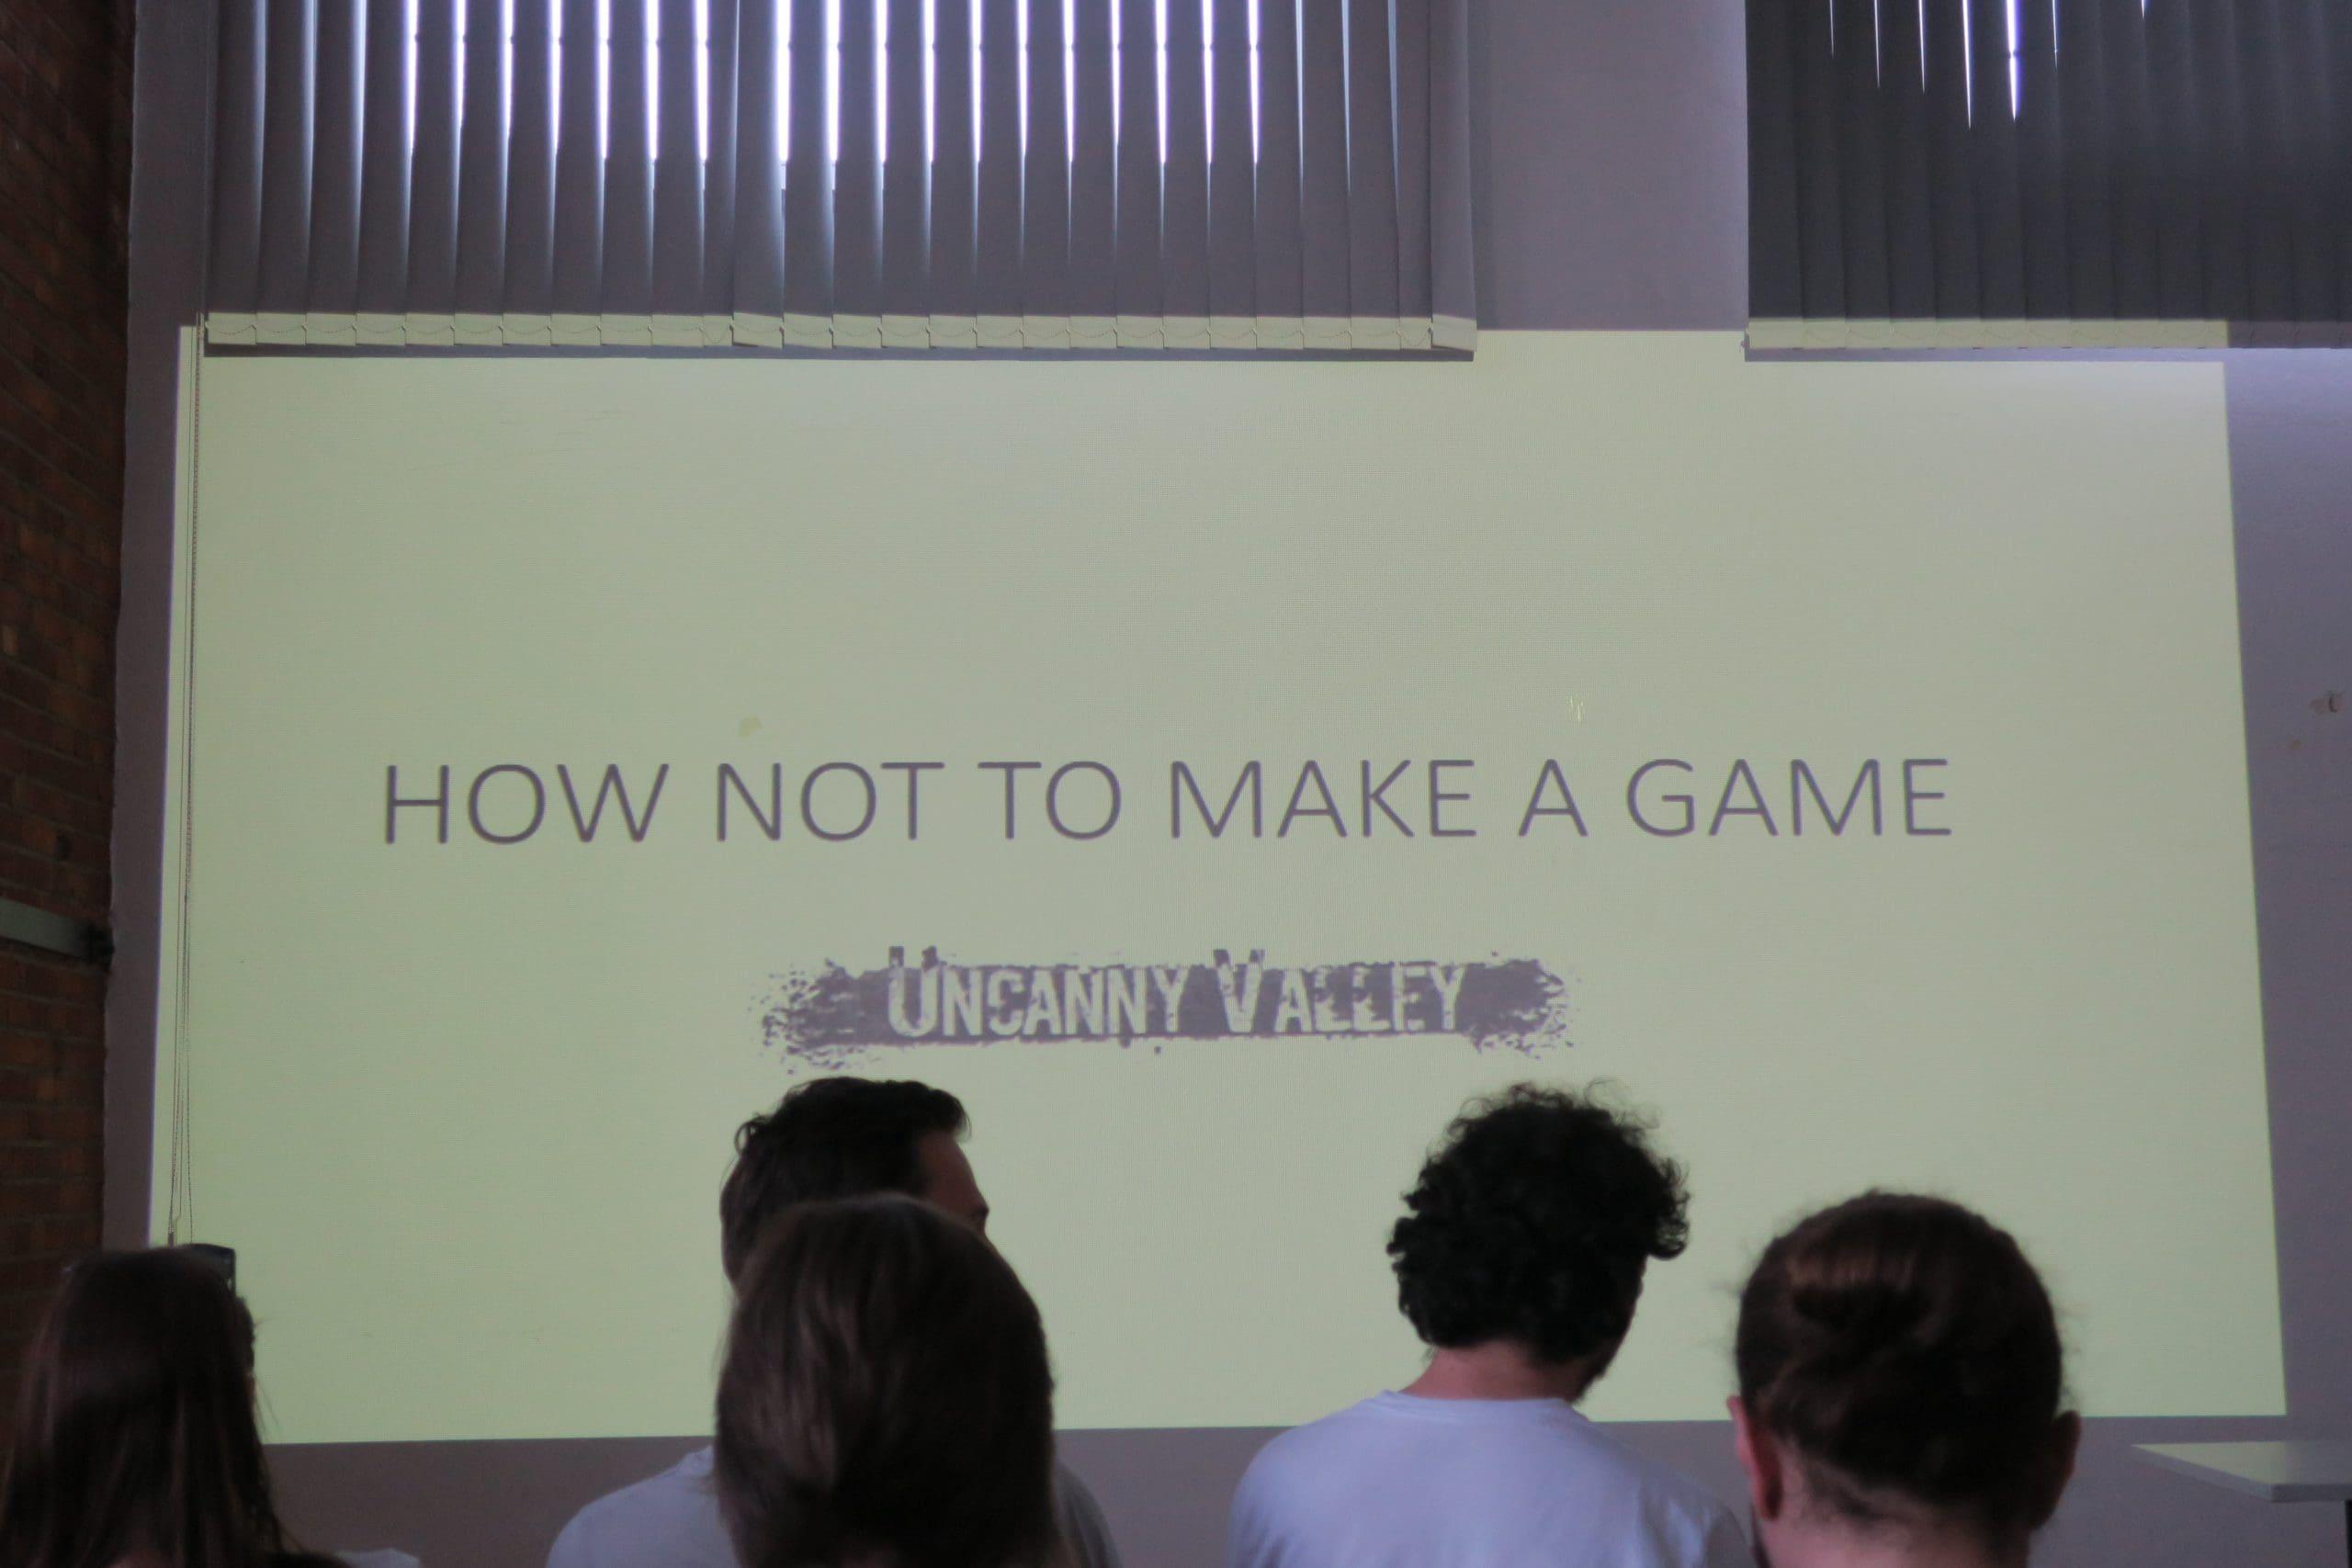 gamedev forum